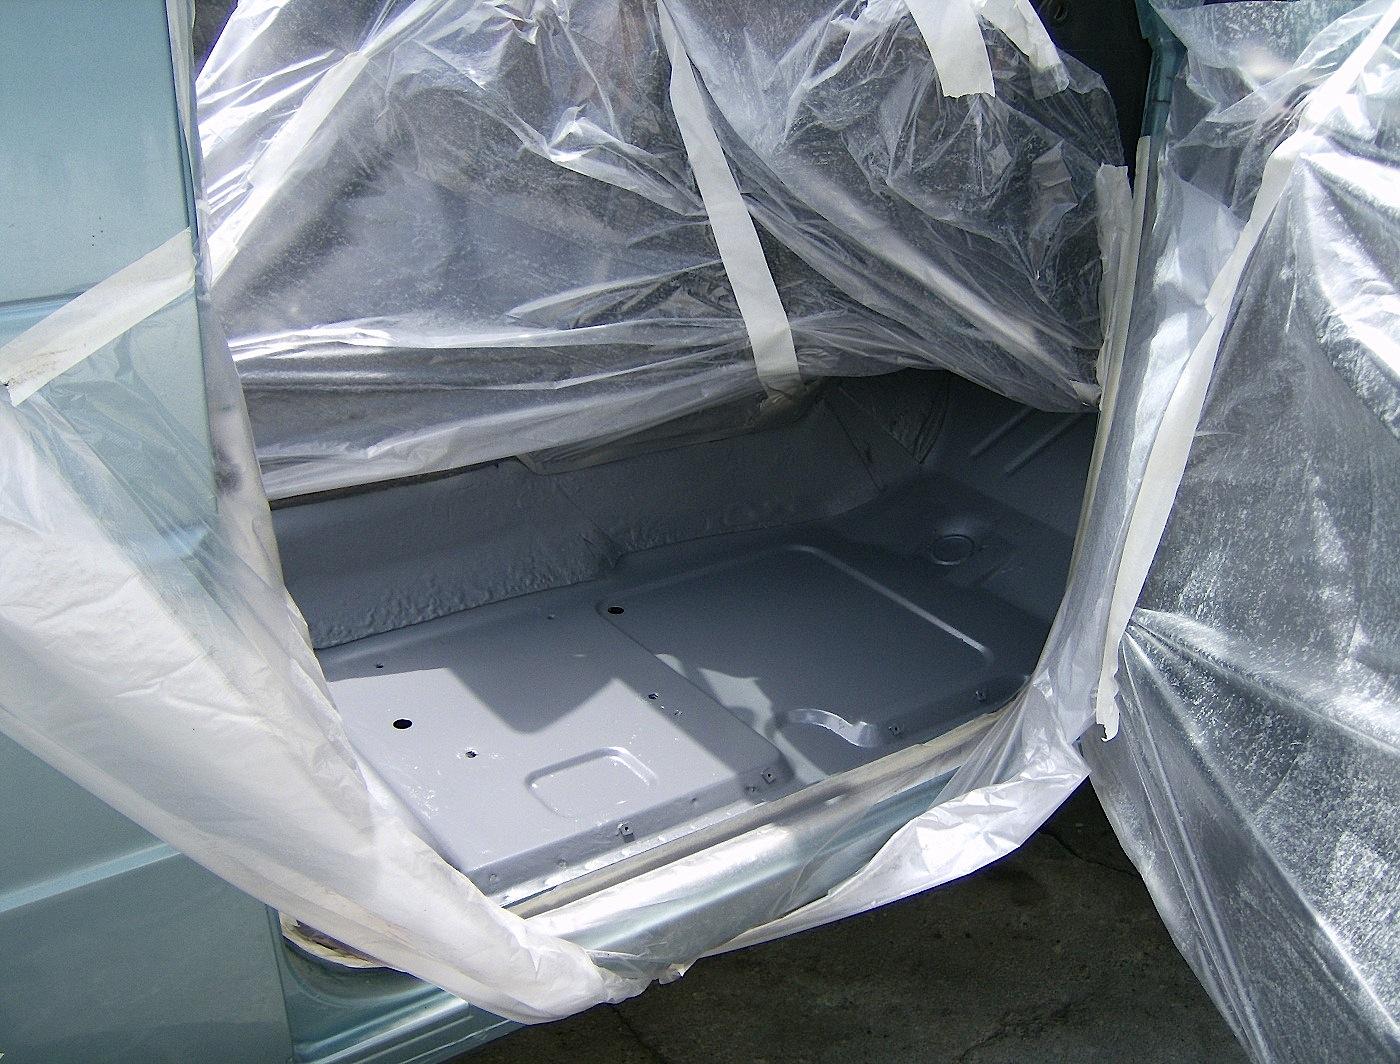 Mercedes G Modell Holucar Oldtimerrestaurierung